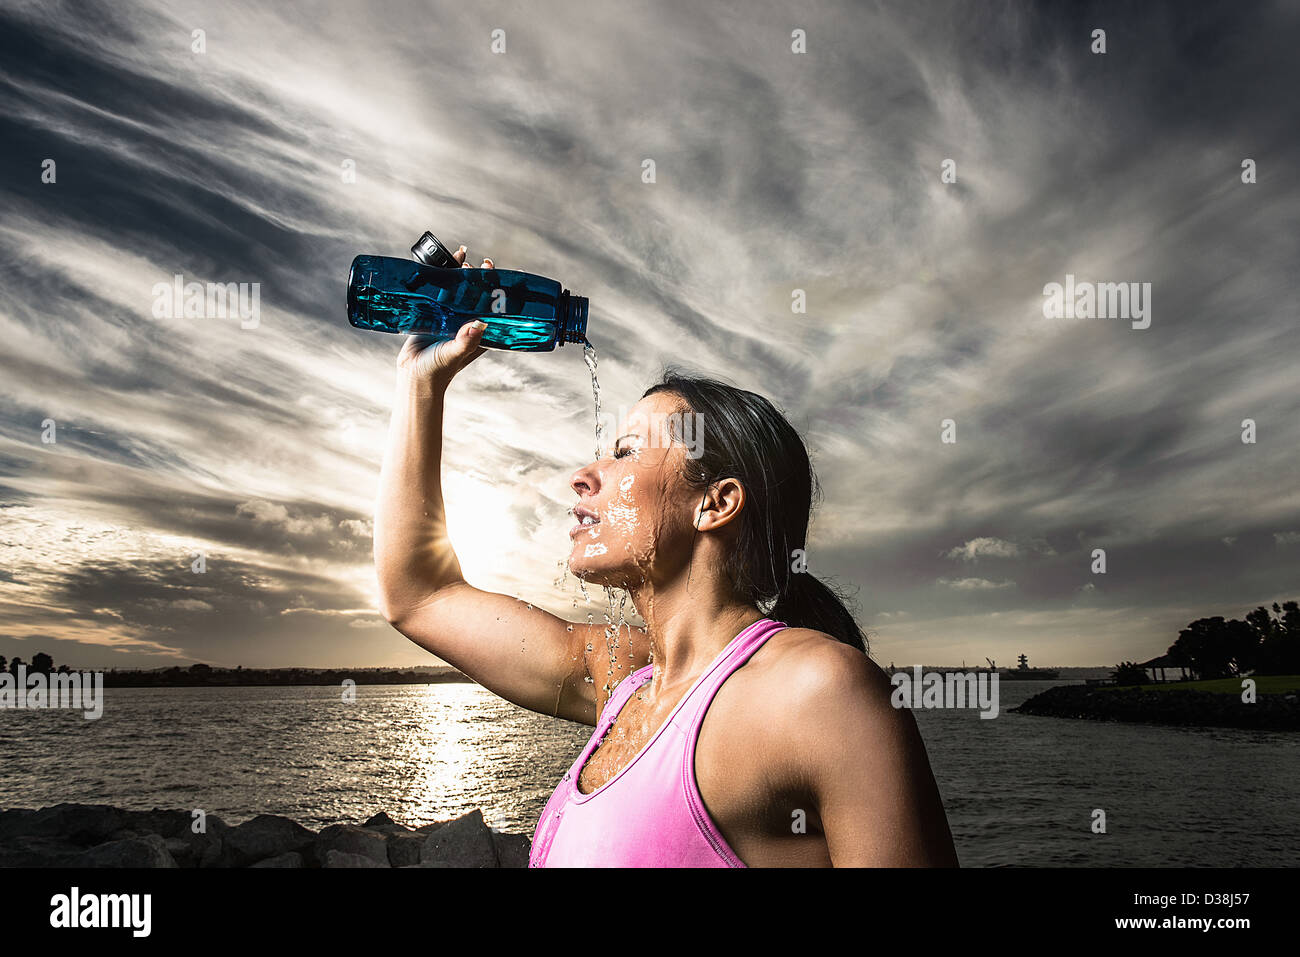 Runner versando acqua su se stessa Foto Stock